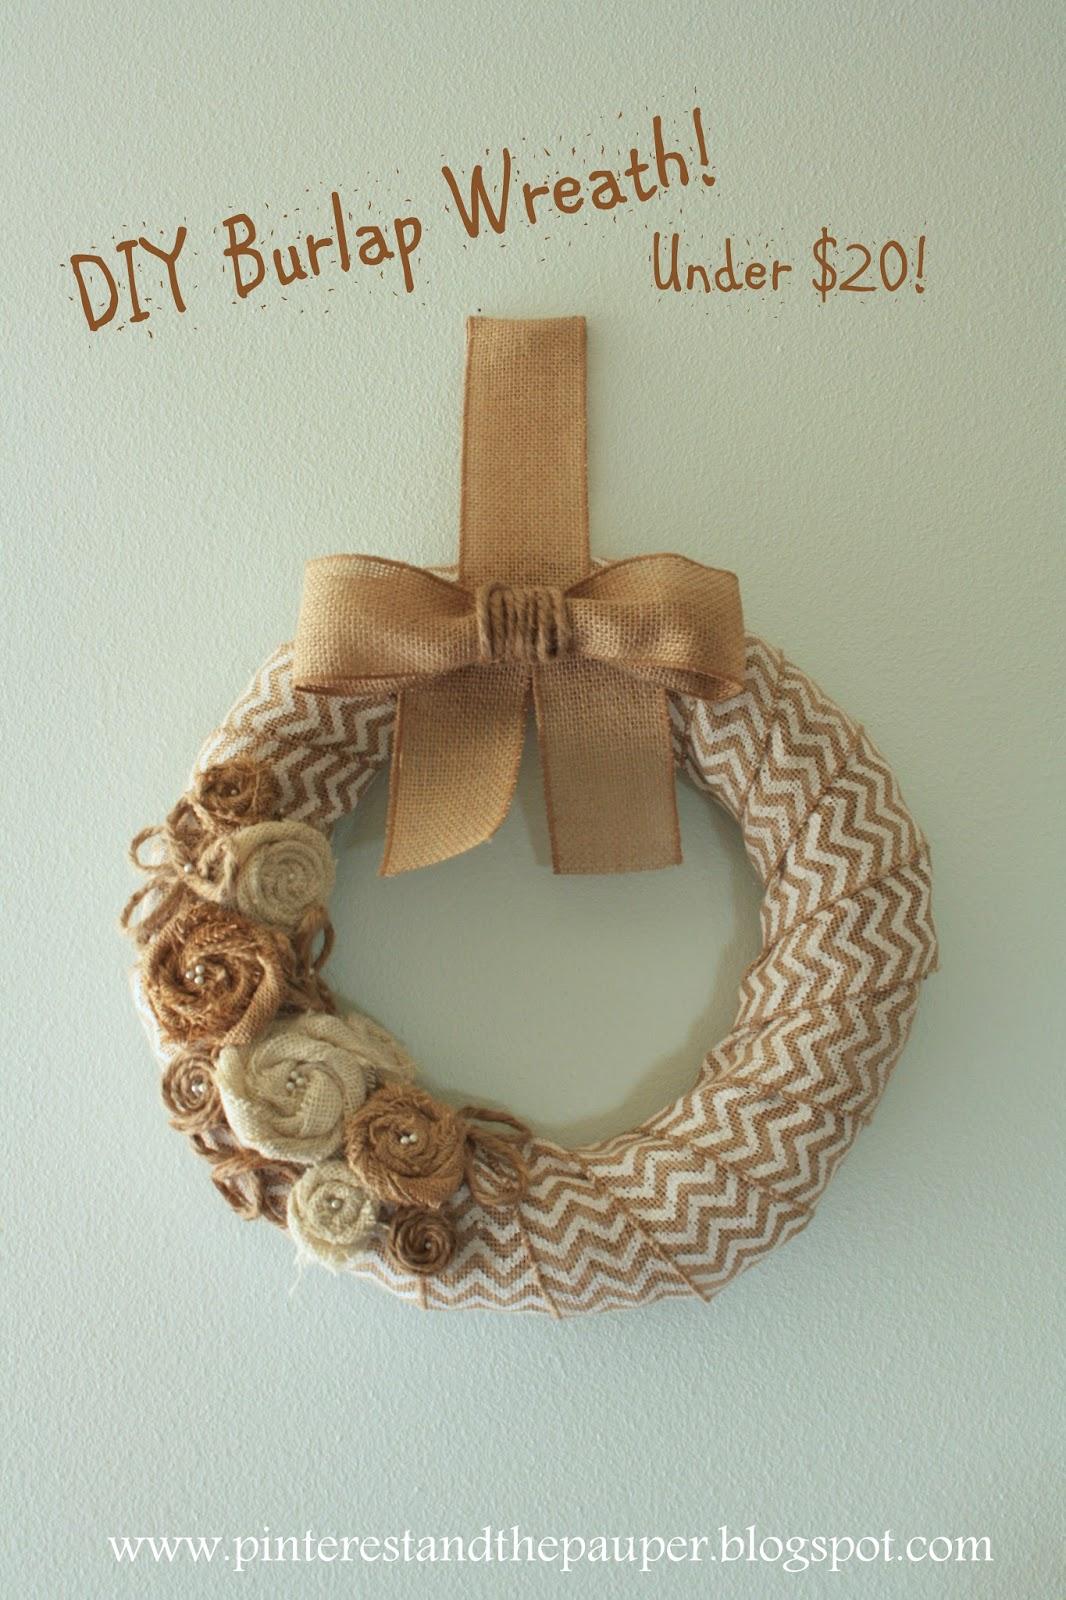 Pinterest and the pauper diy burlap wreath for under 20